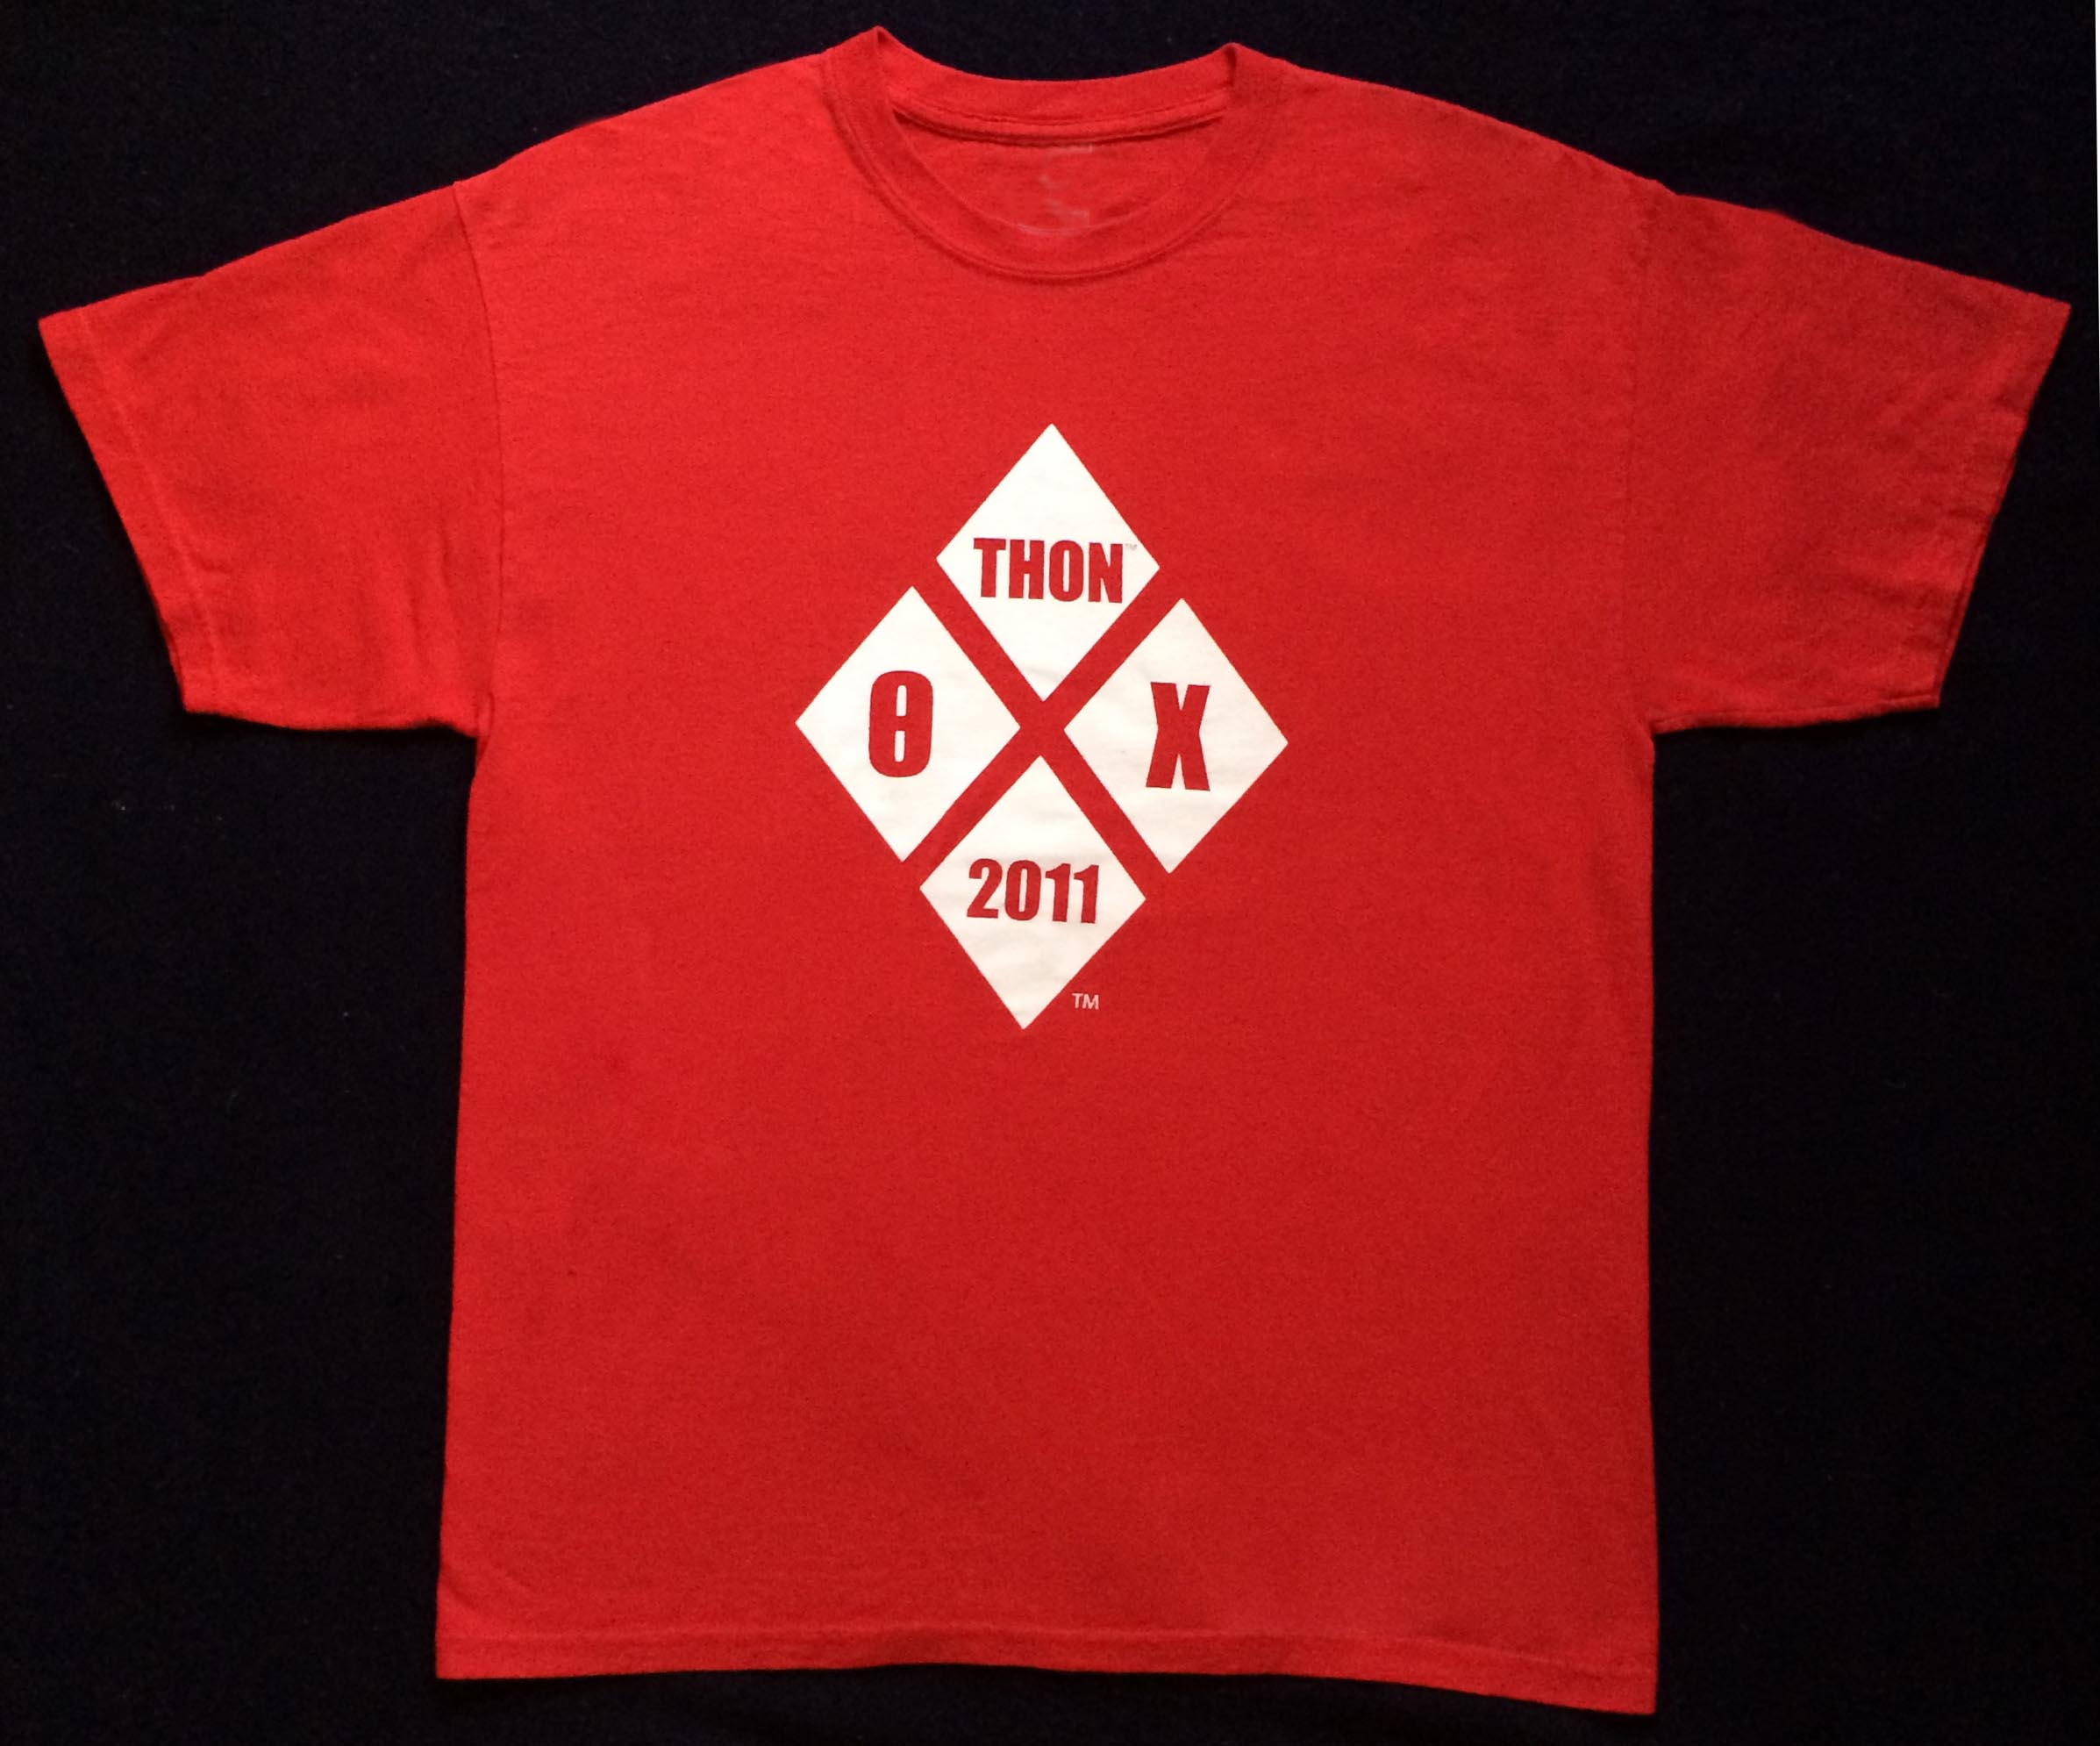 2011 THON T-Shirt (Front) - Feb. 18, 2011